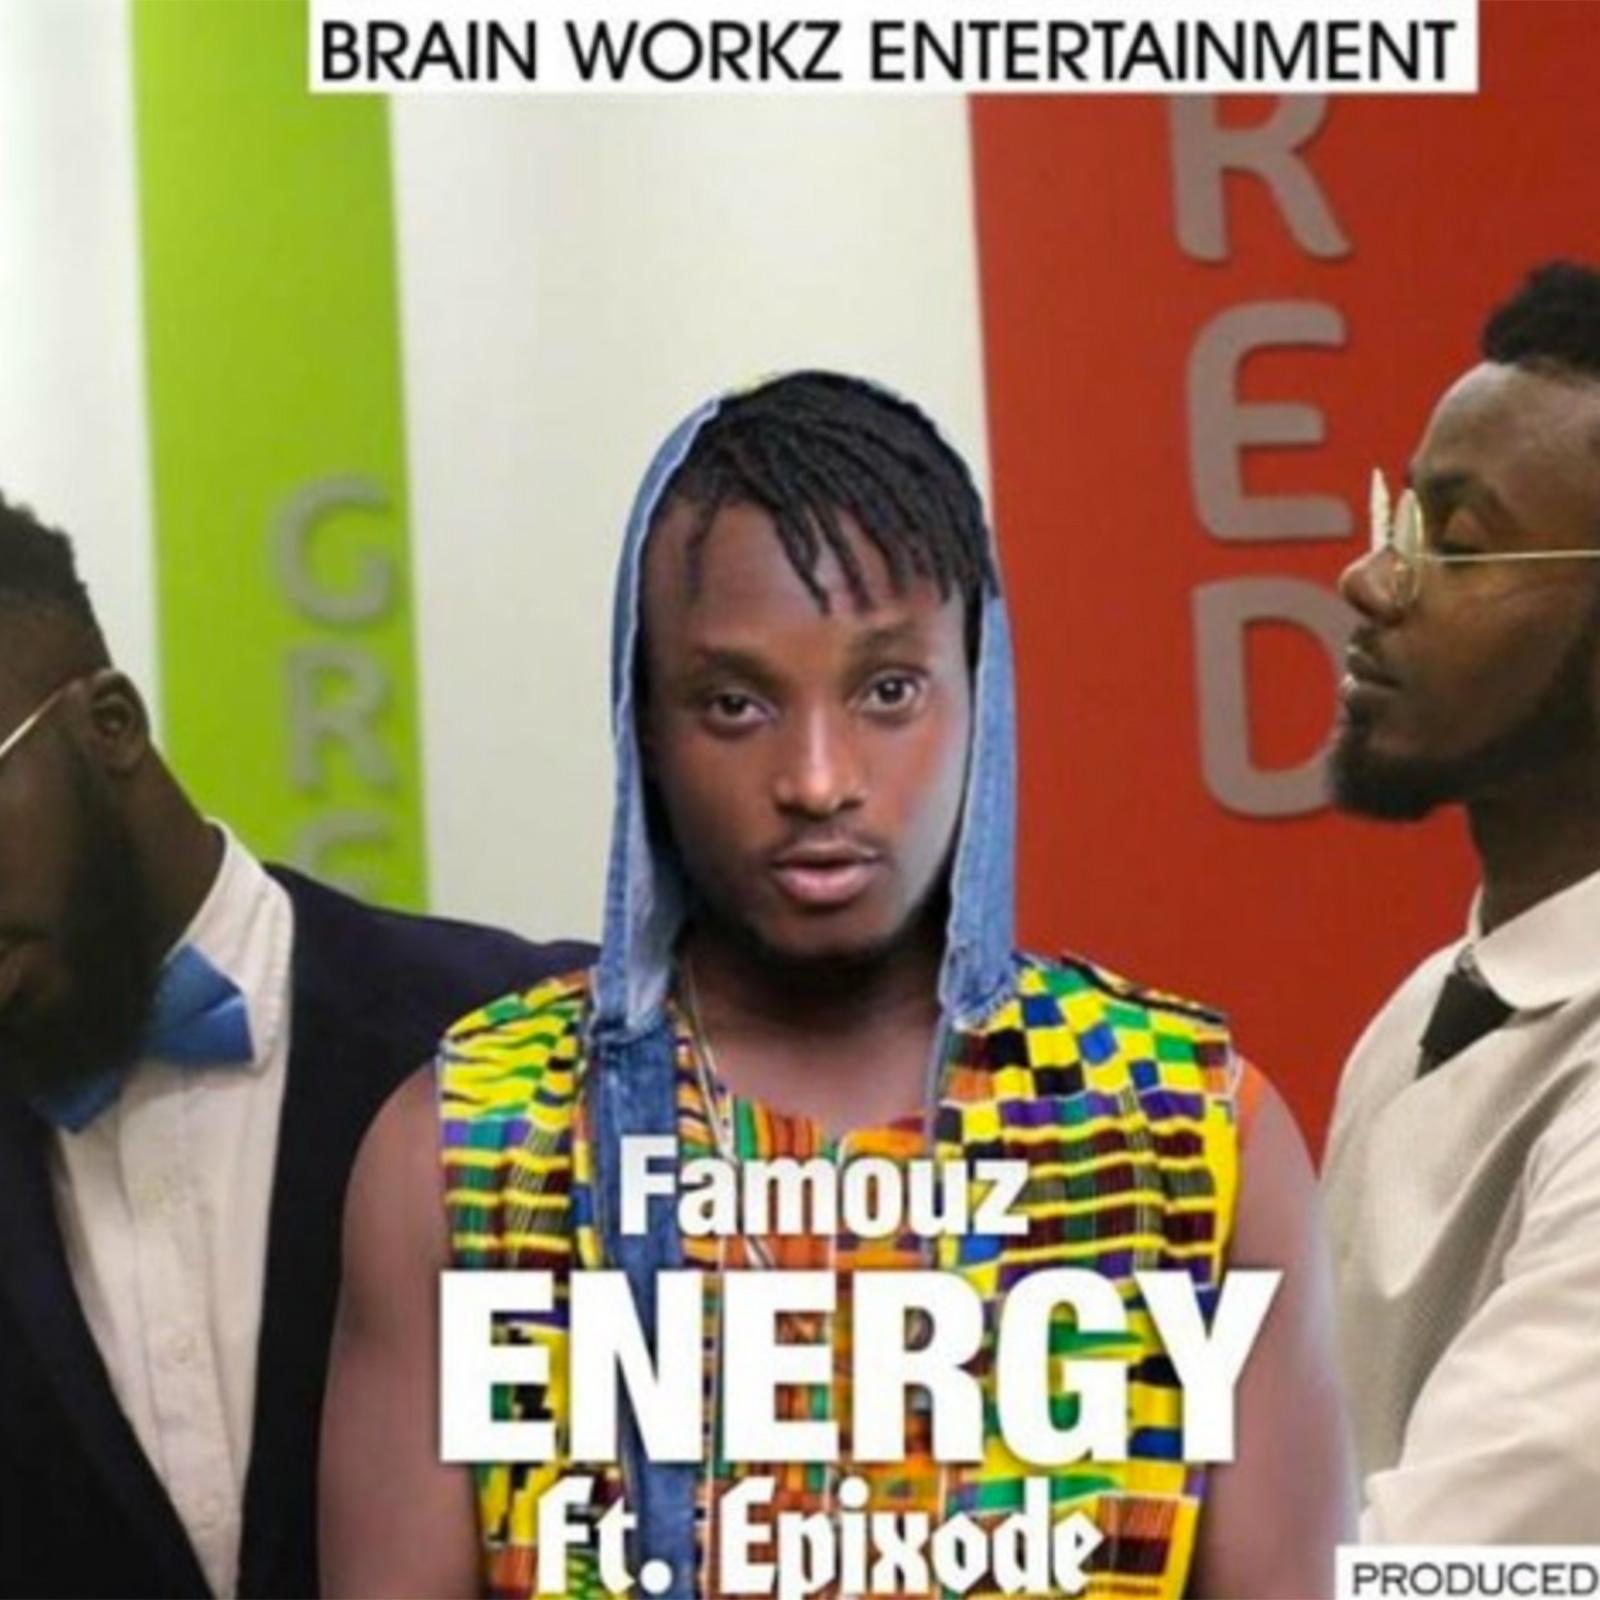 Energy by Famouz feat. Epixode